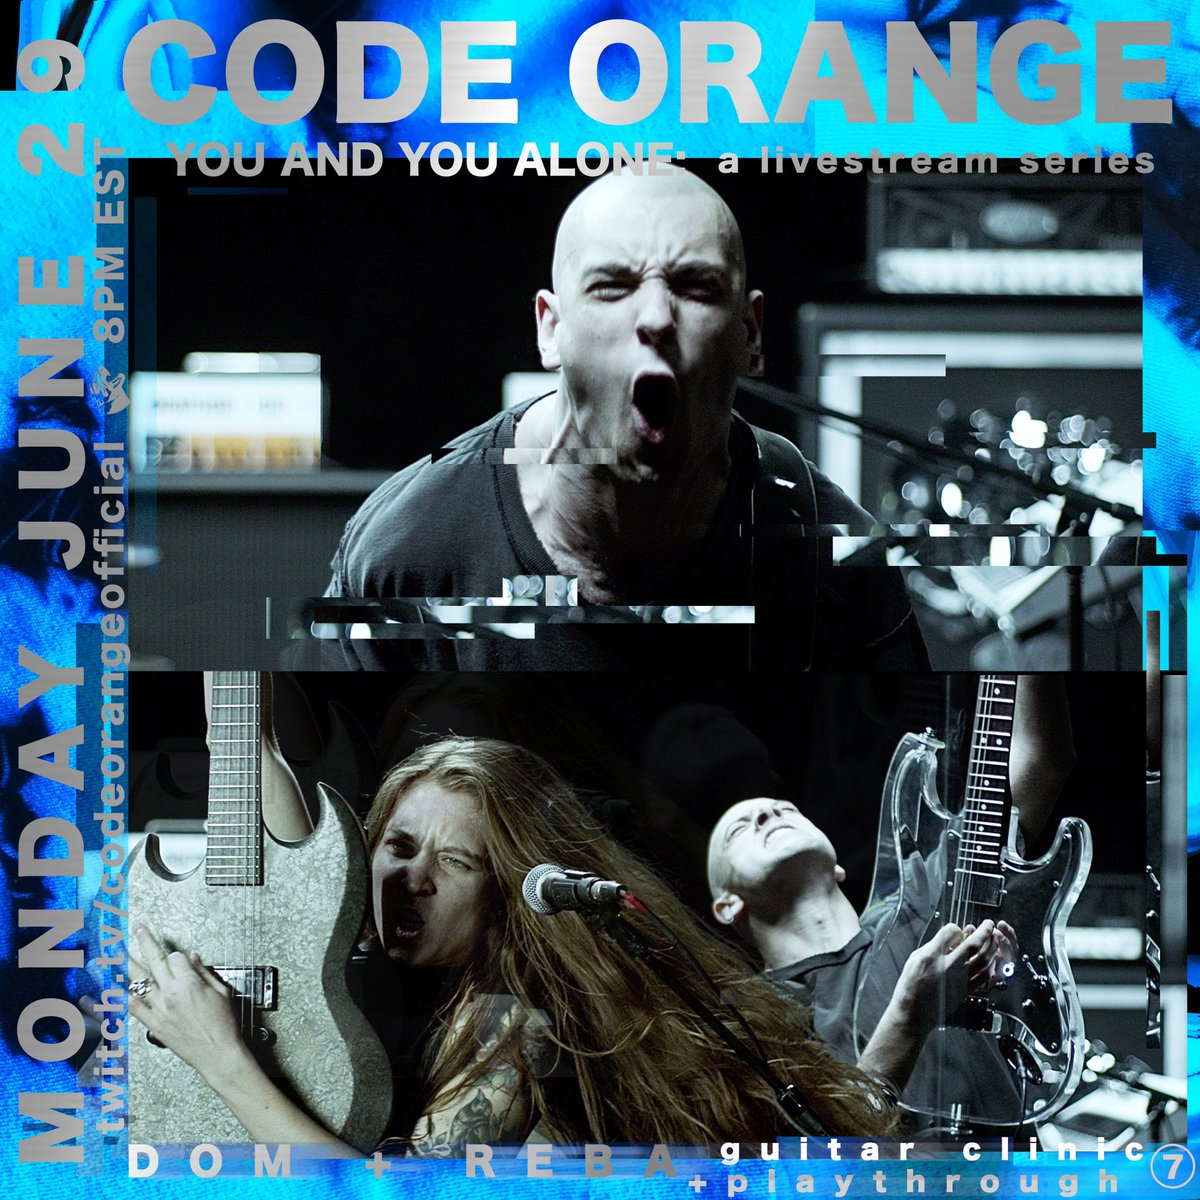 code_orange_yaya_007_01